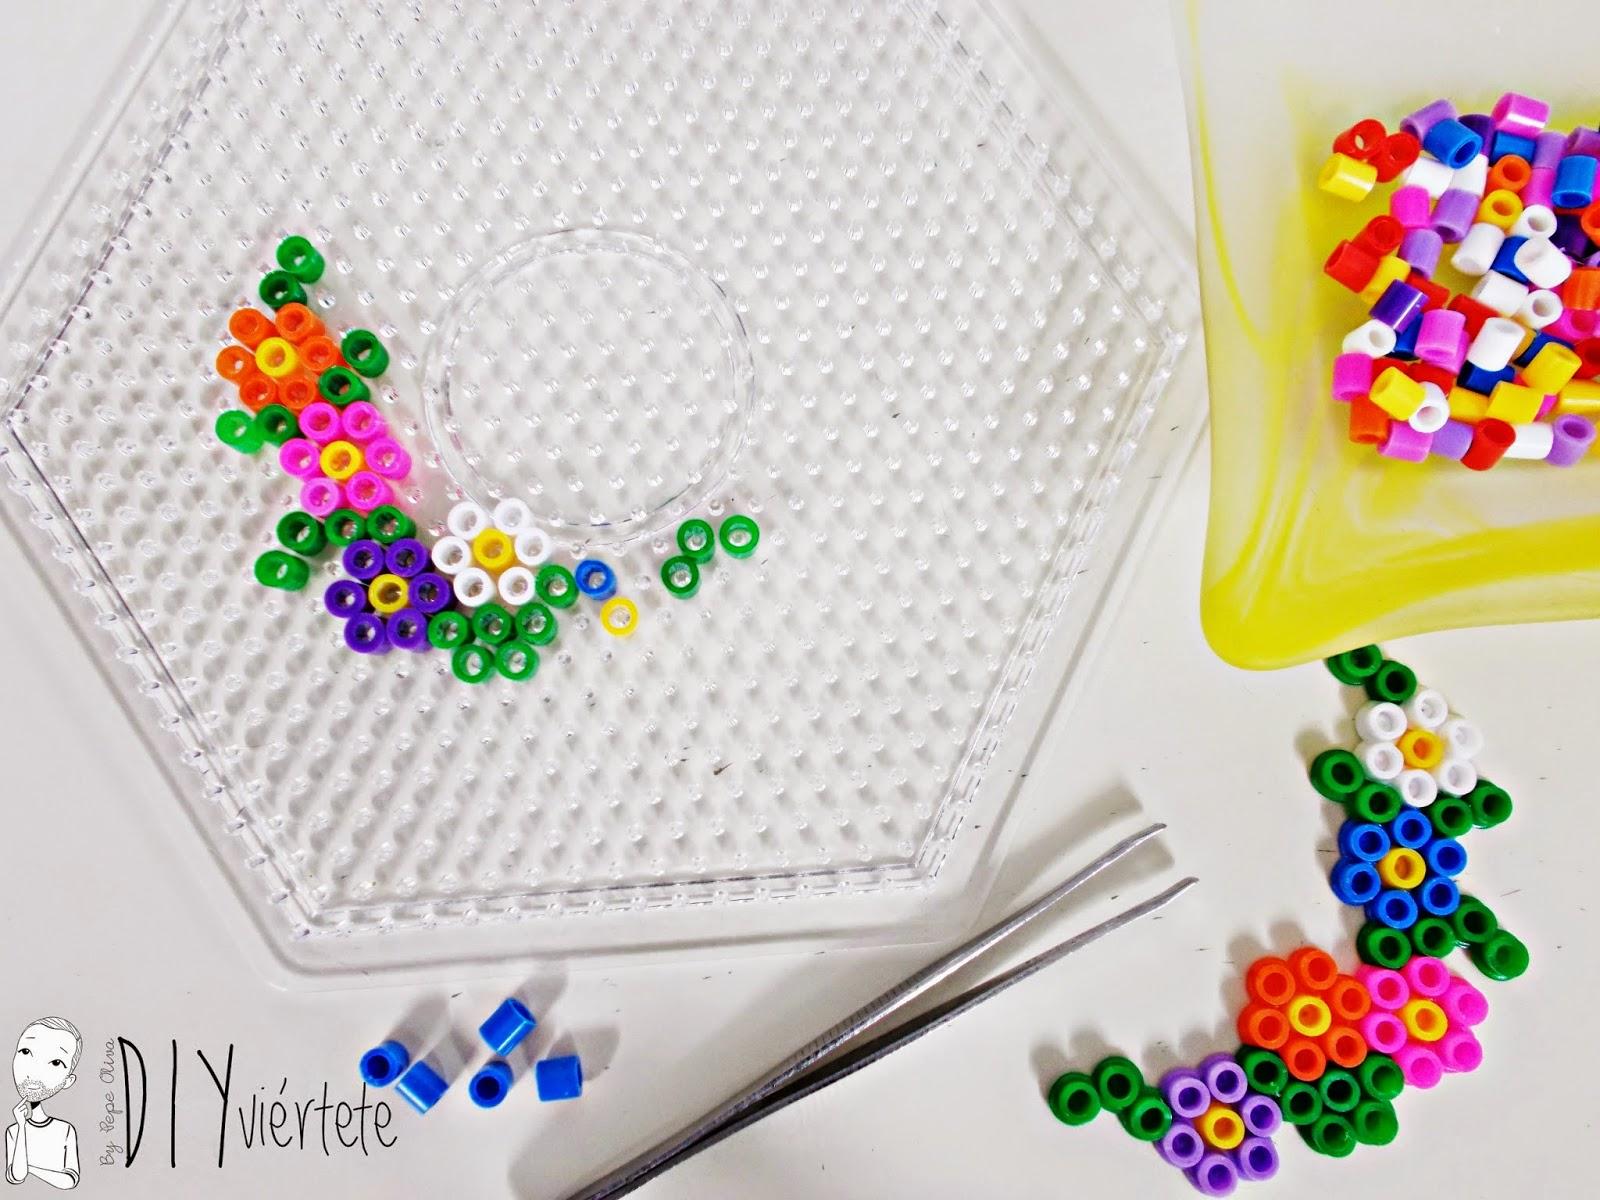 DIY-Do It Yourself-caja-cartón-selfpackaging-customizar-handbox-yodona-diyhuntersday-craftlovers-4